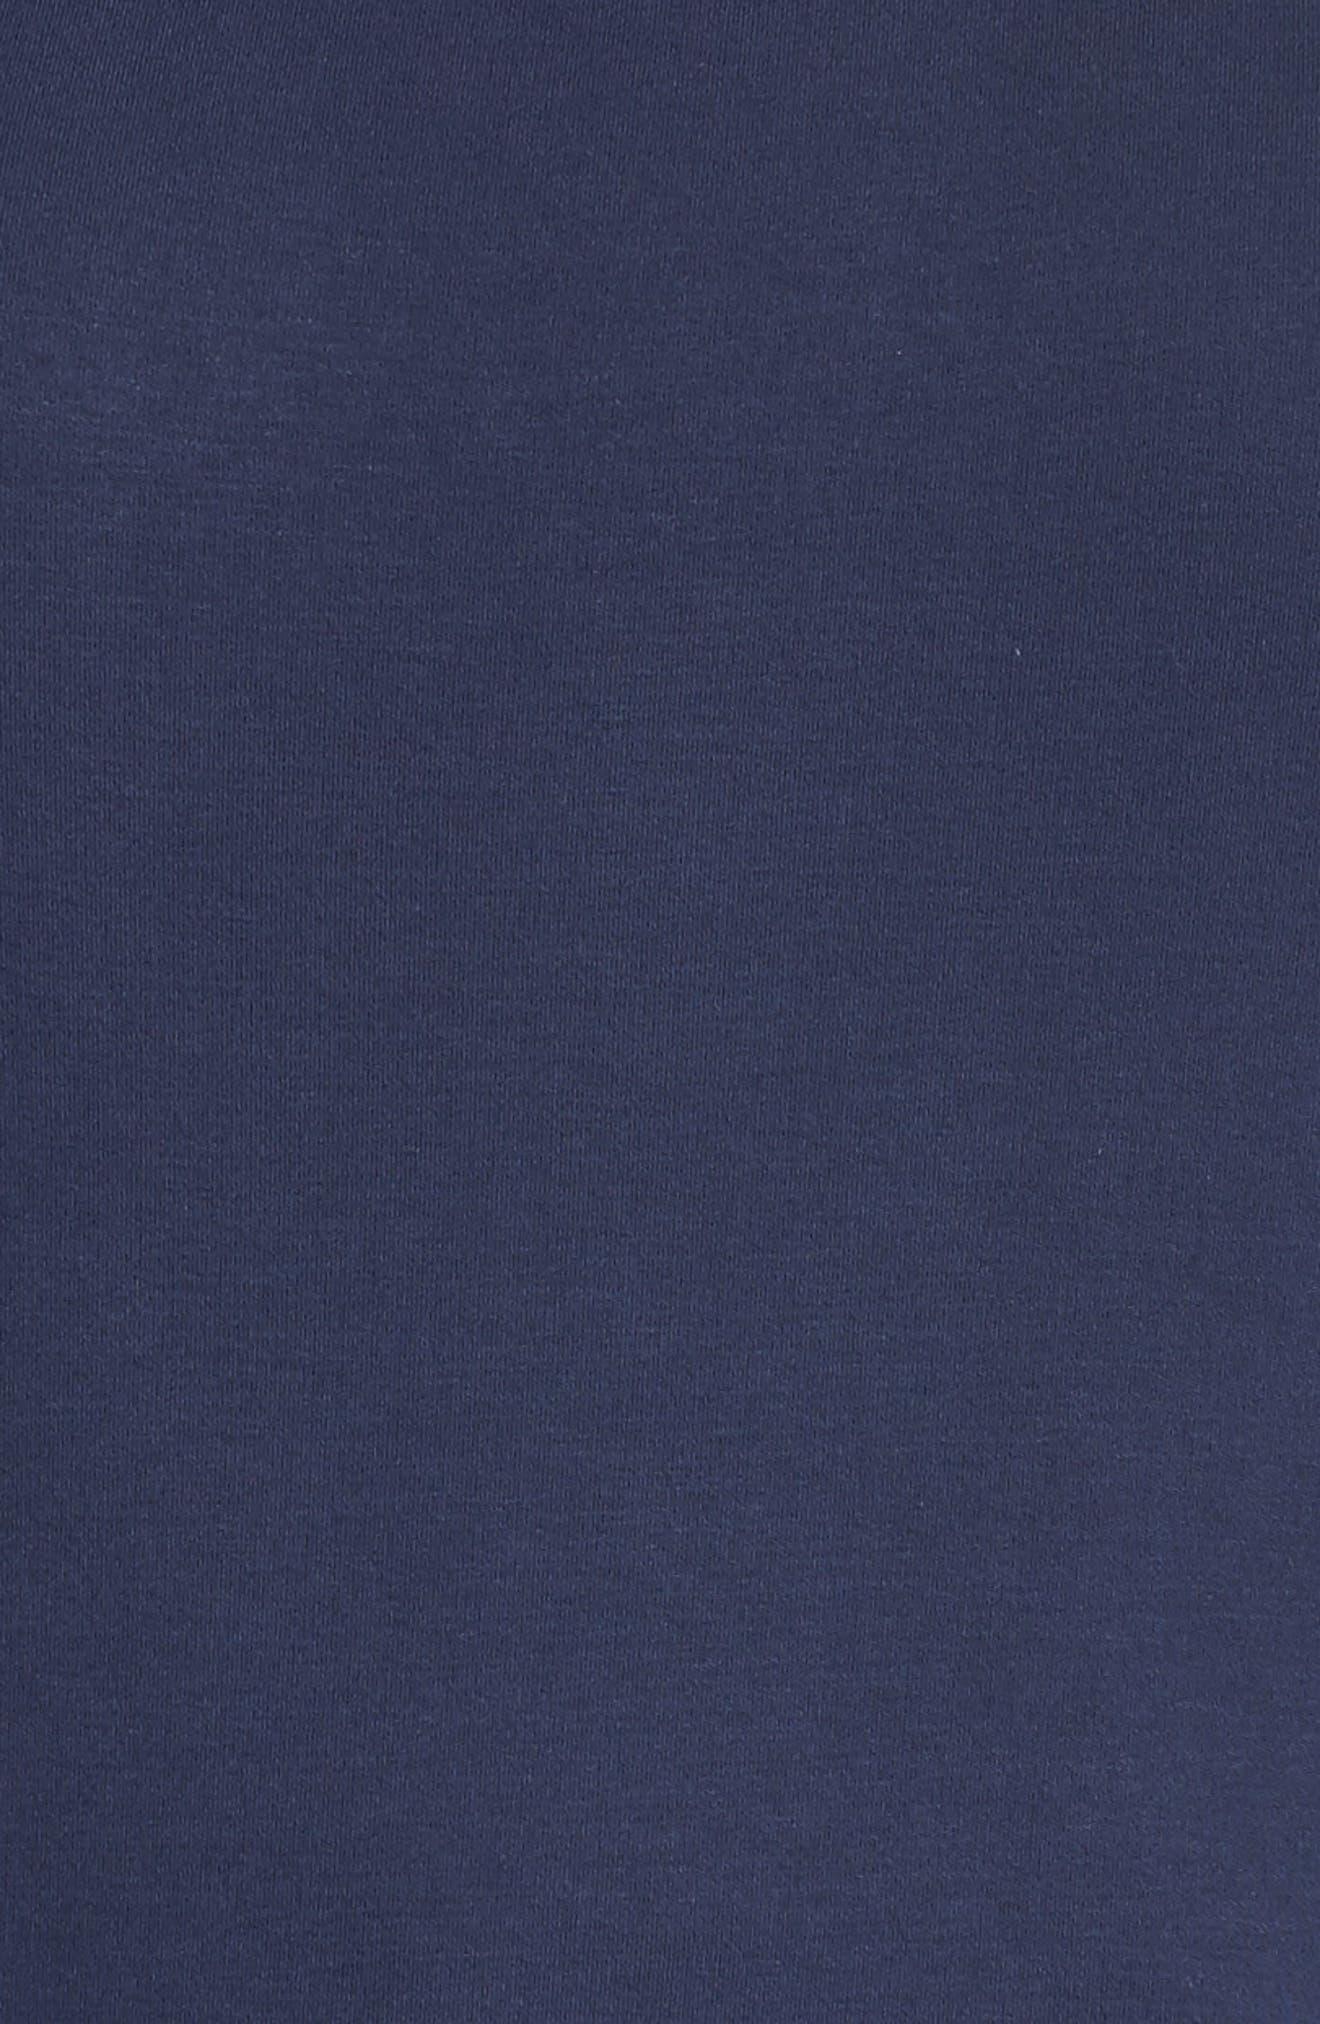 Pleat Ruffle Sleeve Top,                             Alternate thumbnail 5, color,                             Navy